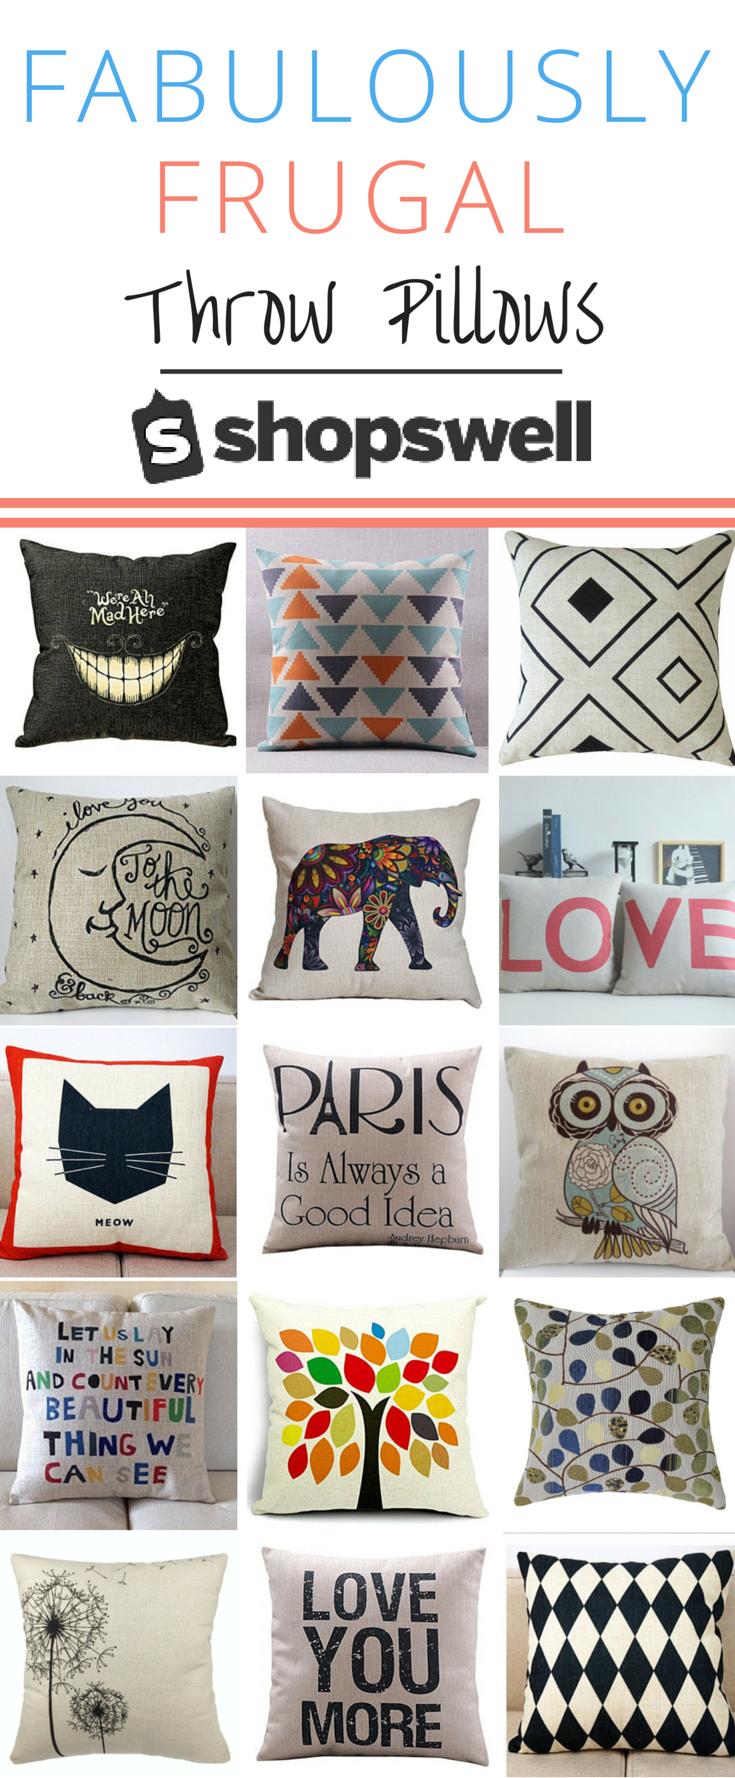 Chic, Fabulous (and cheap!) Throw Pillows | Frugal, Throw pillows ...